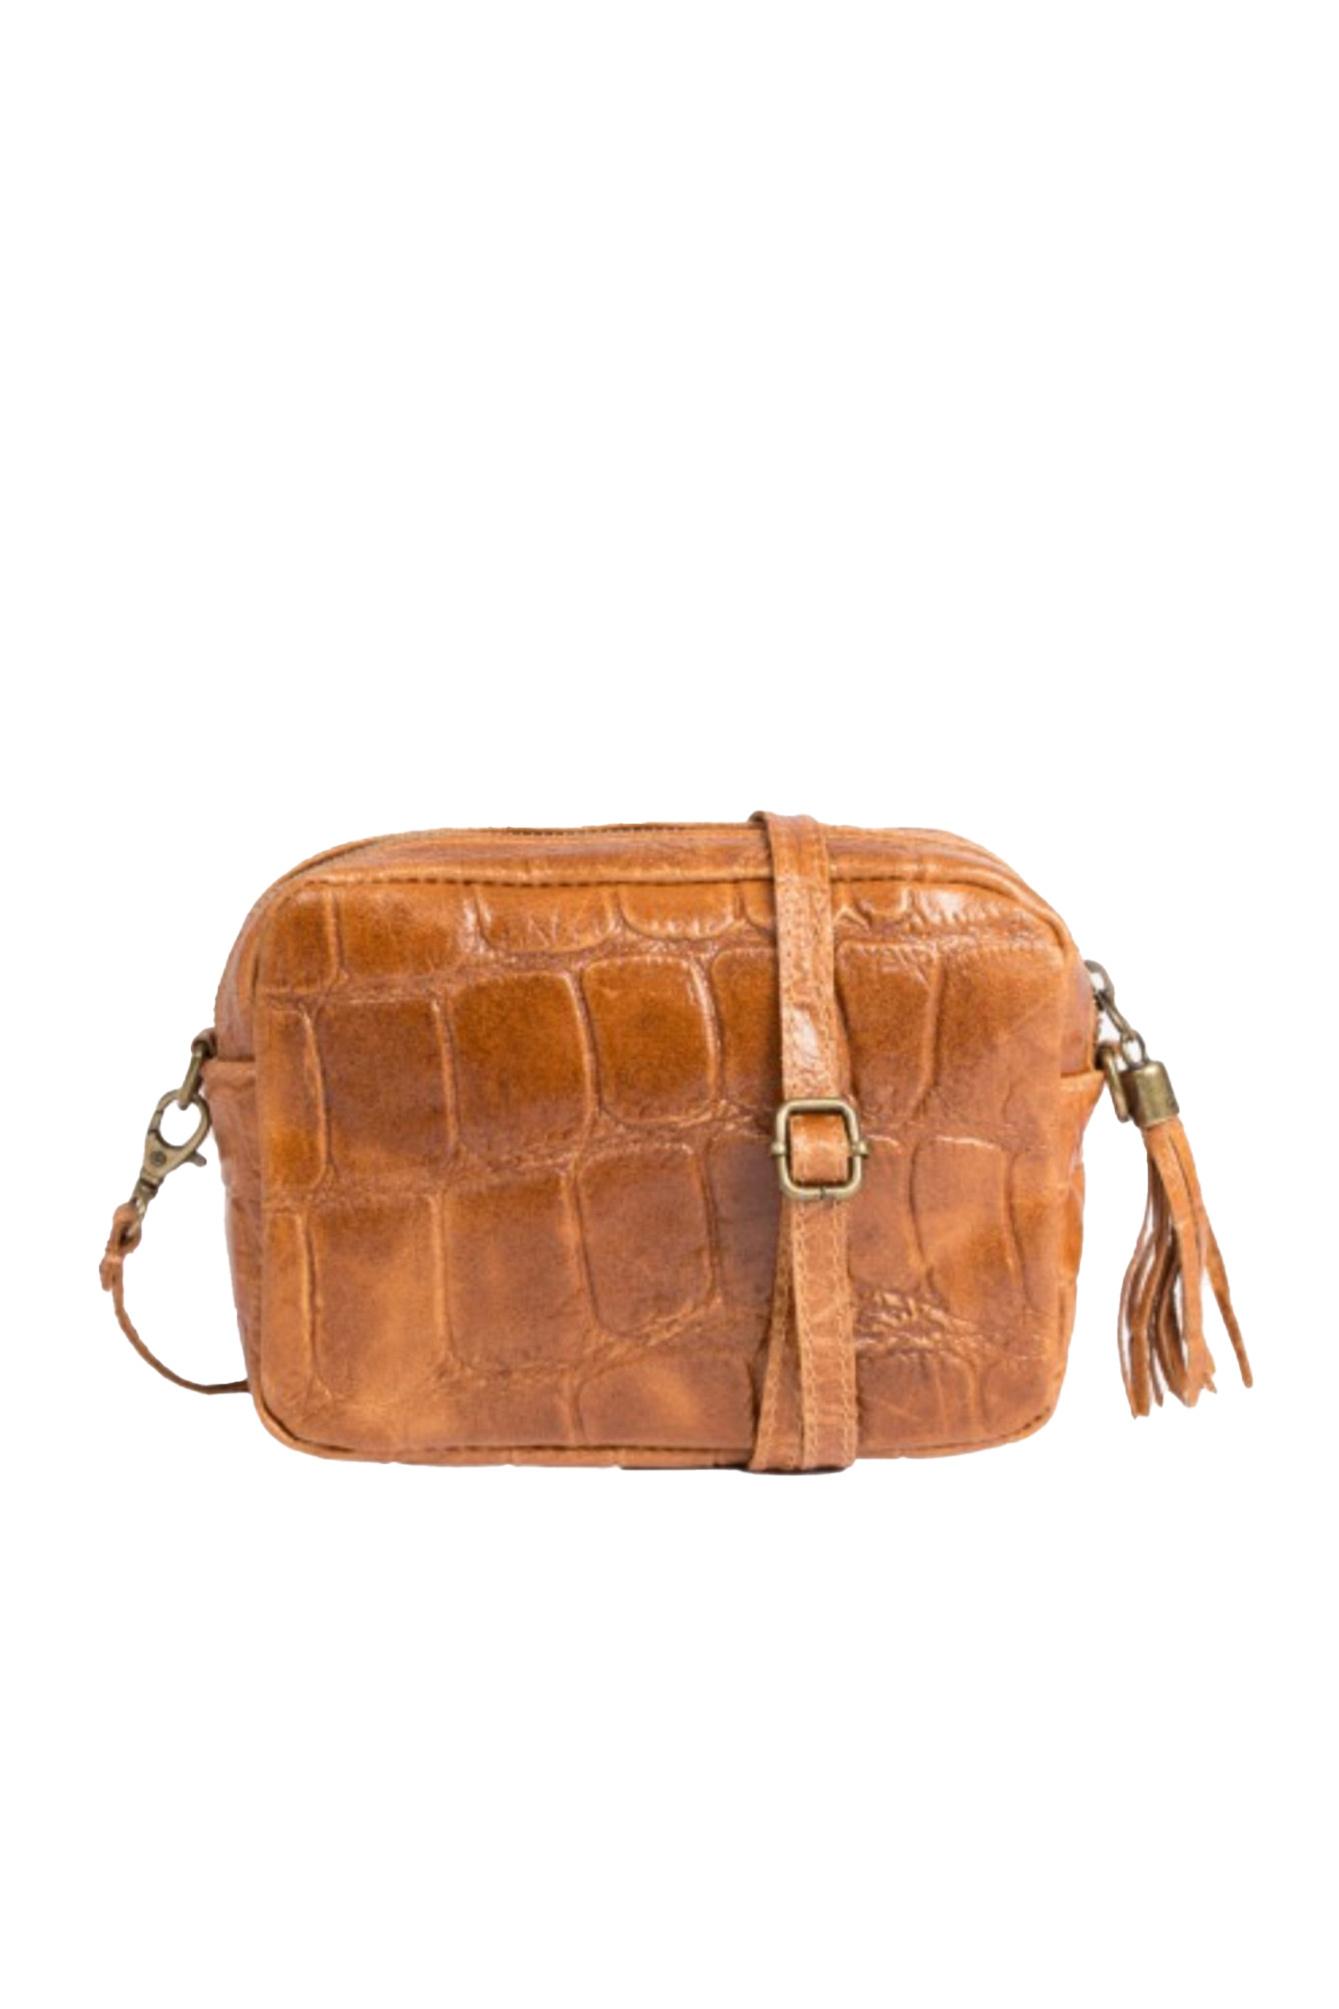 Croco leather bag camel